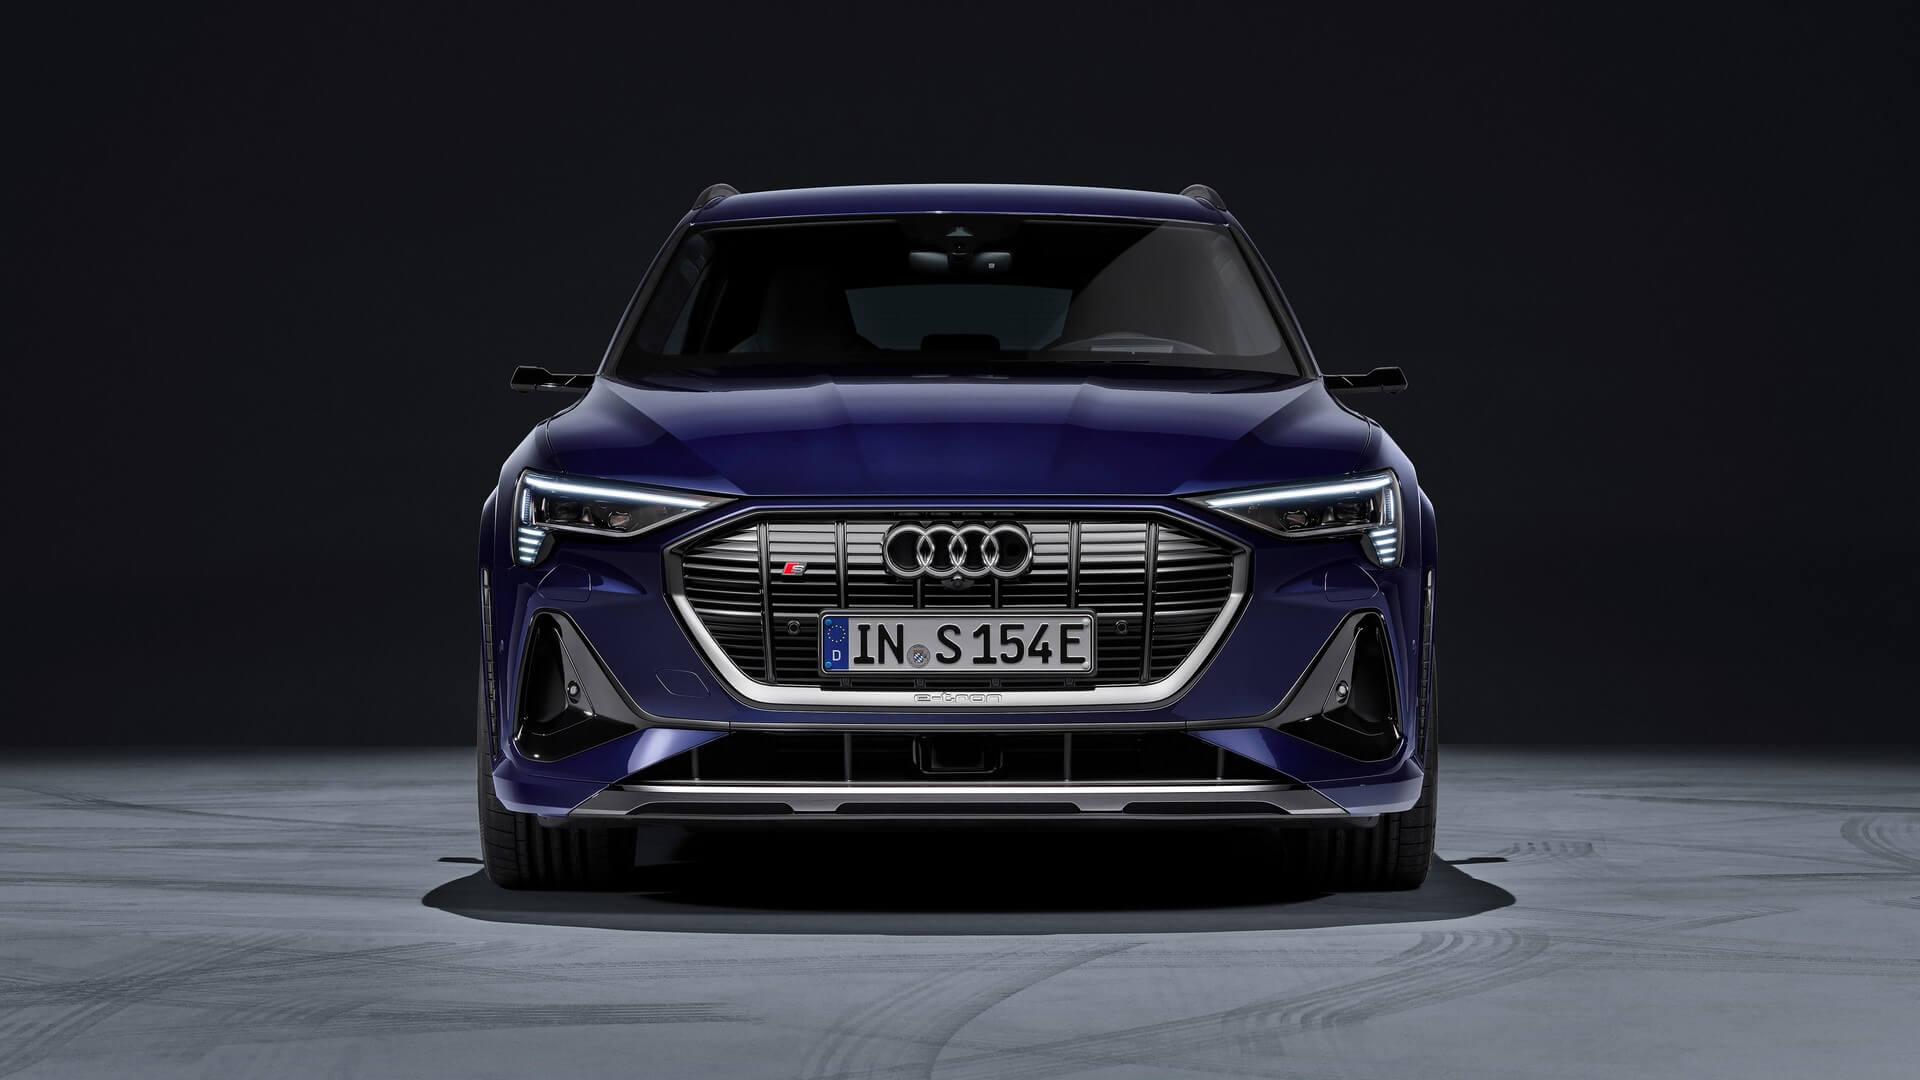 Audi-E-Tron-S-and-E-Tron-S-Sportback-2020-30